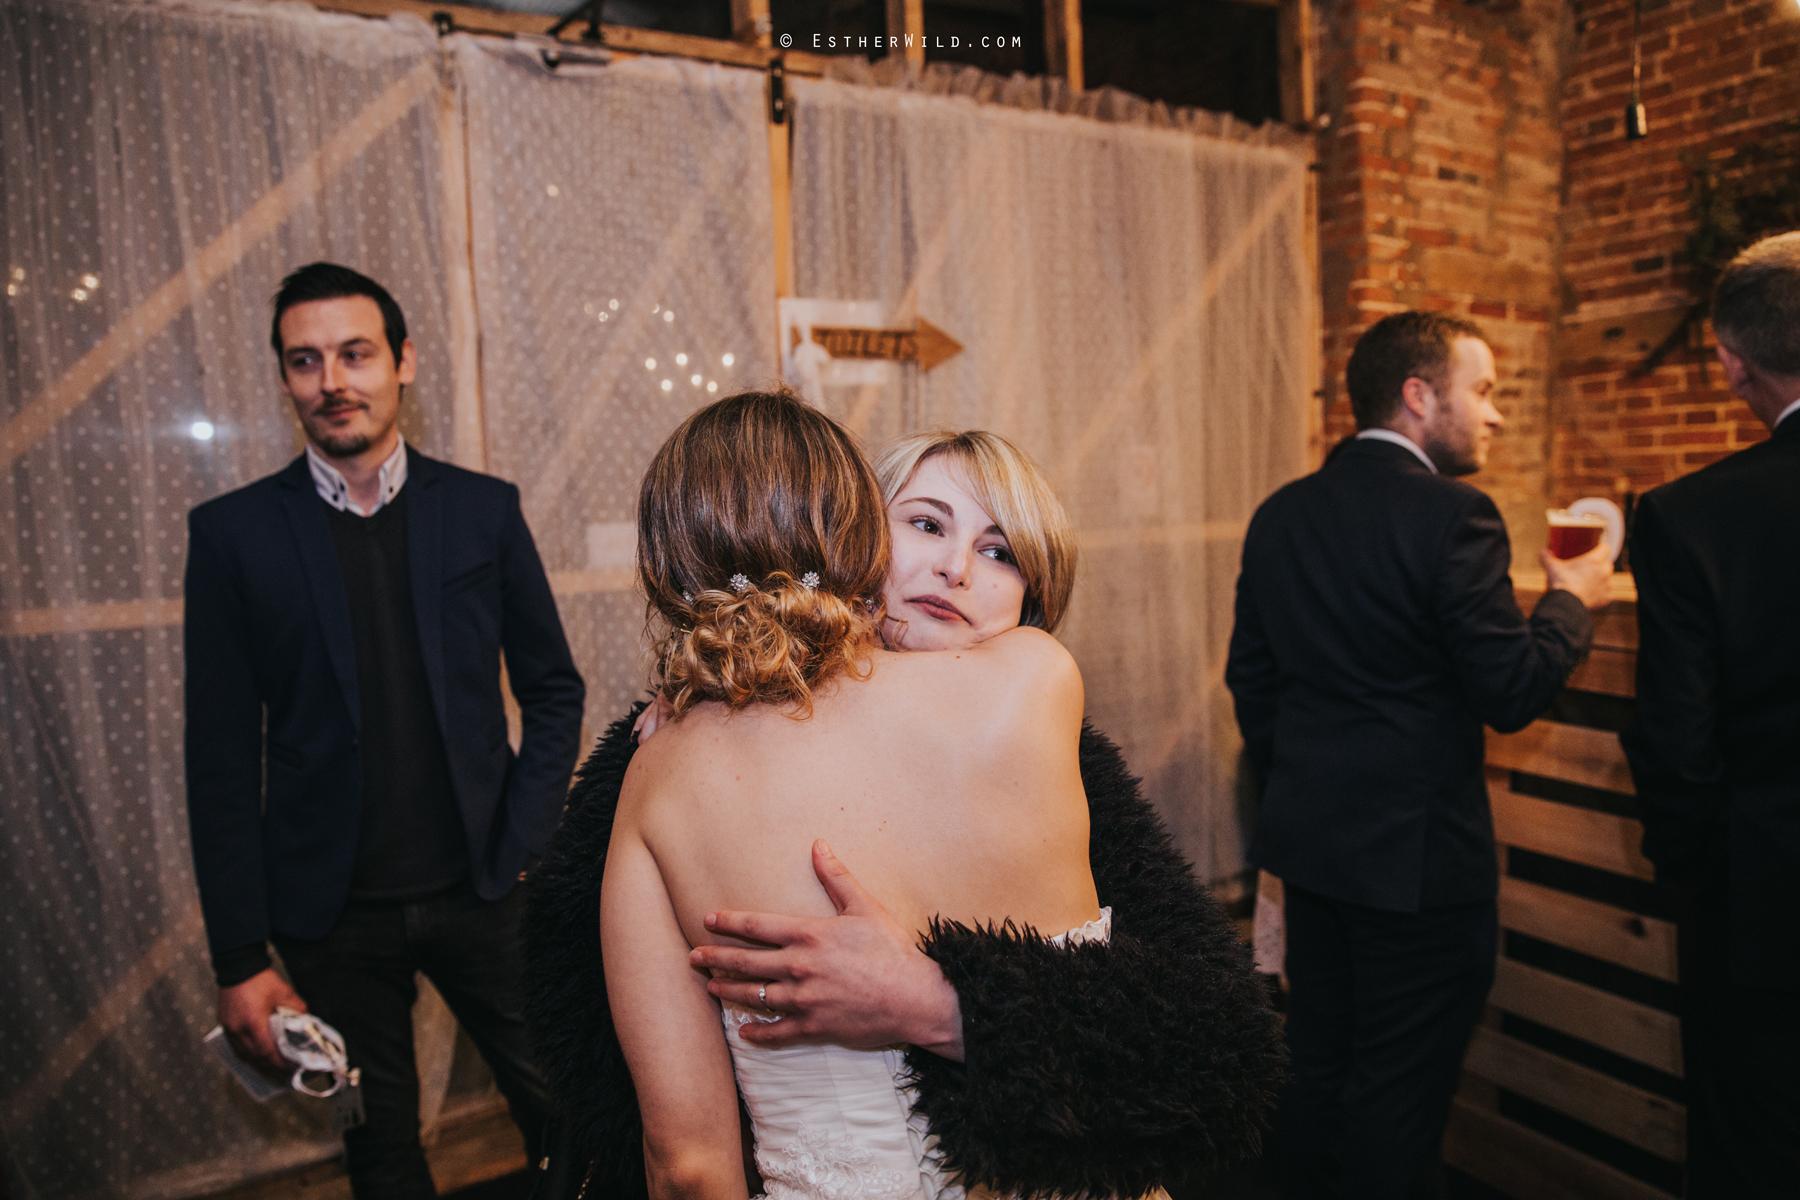 Glebe_Farm_Barn_Rustic_Norfolk_Wedding_Esther_Wild_Photographer_Copyright_IMG_2775.jpg